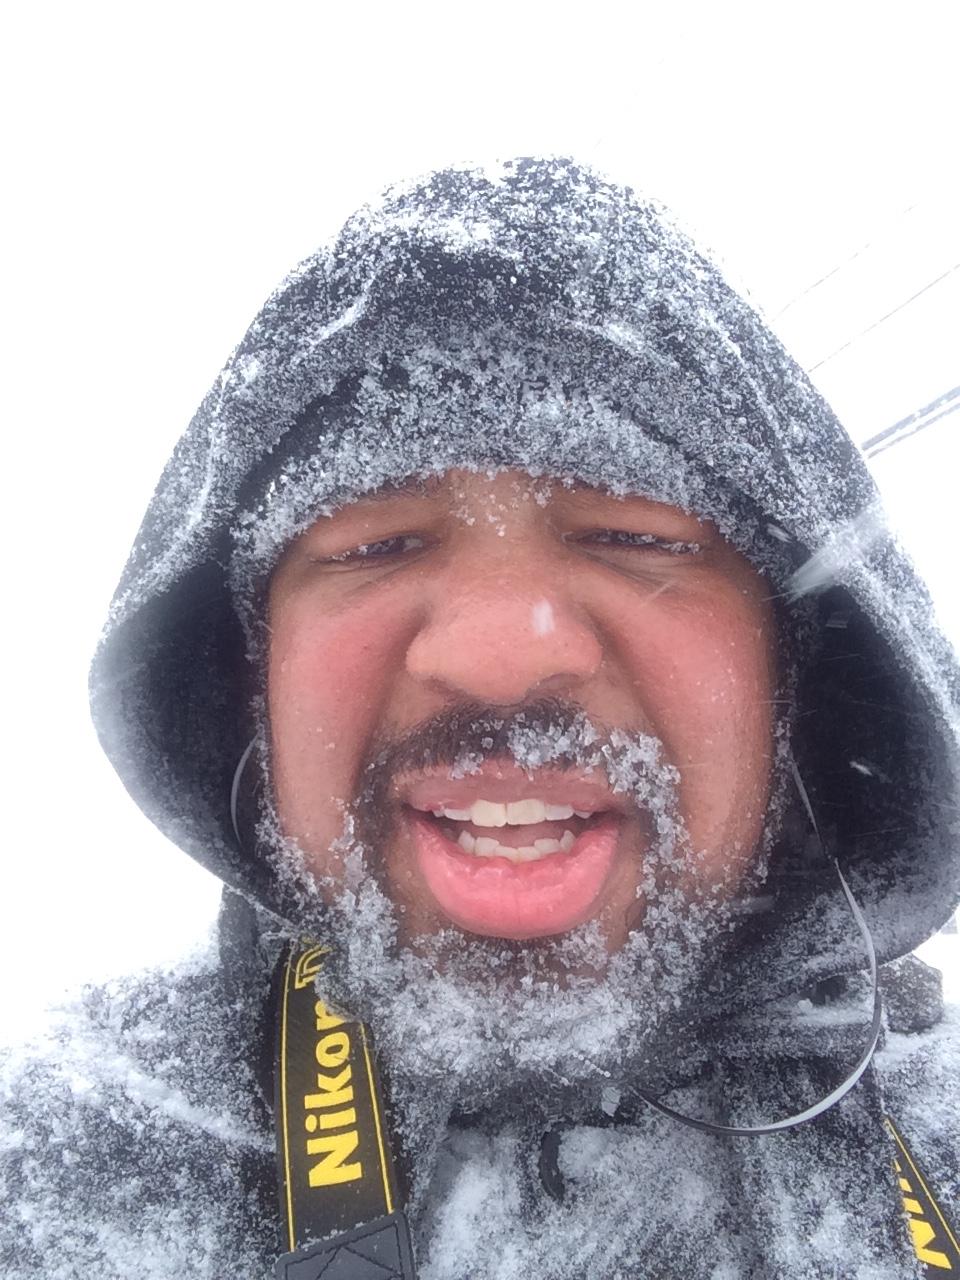 I'm not above a frozen, blizzard selfie